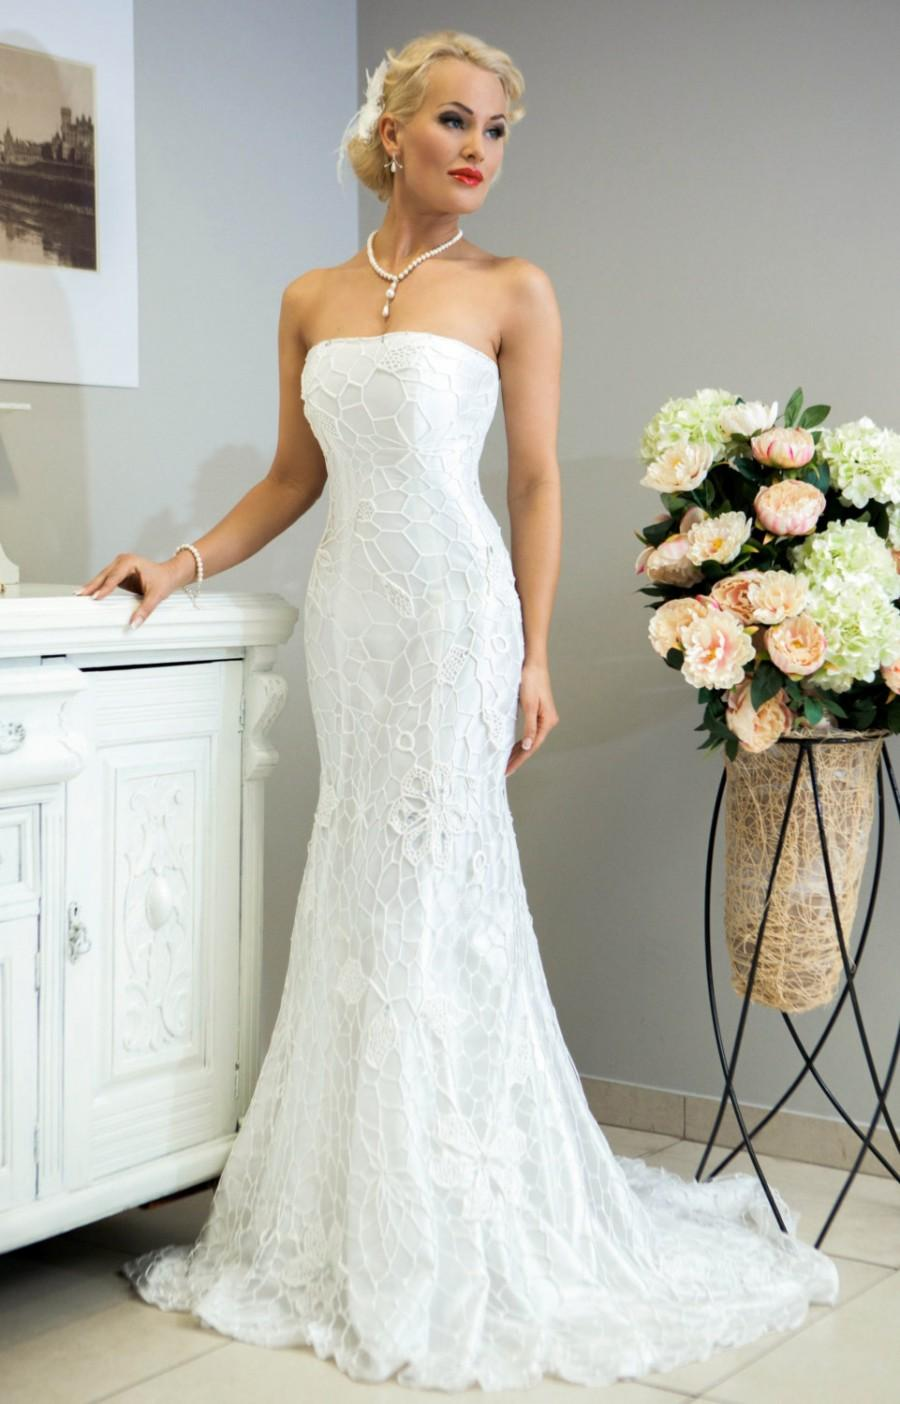 sale miss evita crochet wedding dress wedding dresses for sale SALE Miss Evita crochet wedding dress